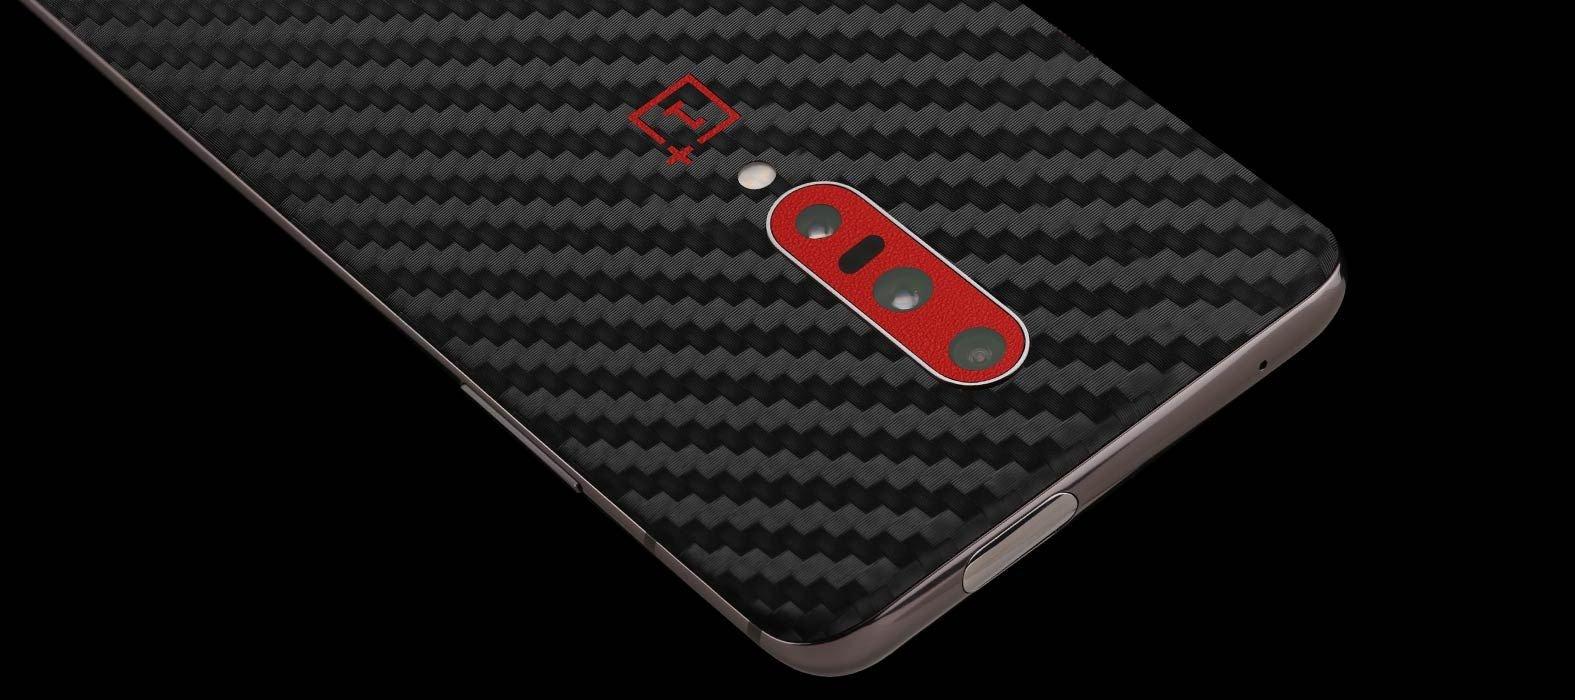 Oneplus-7-Pro_Black-Carbon-Fiber_Skins